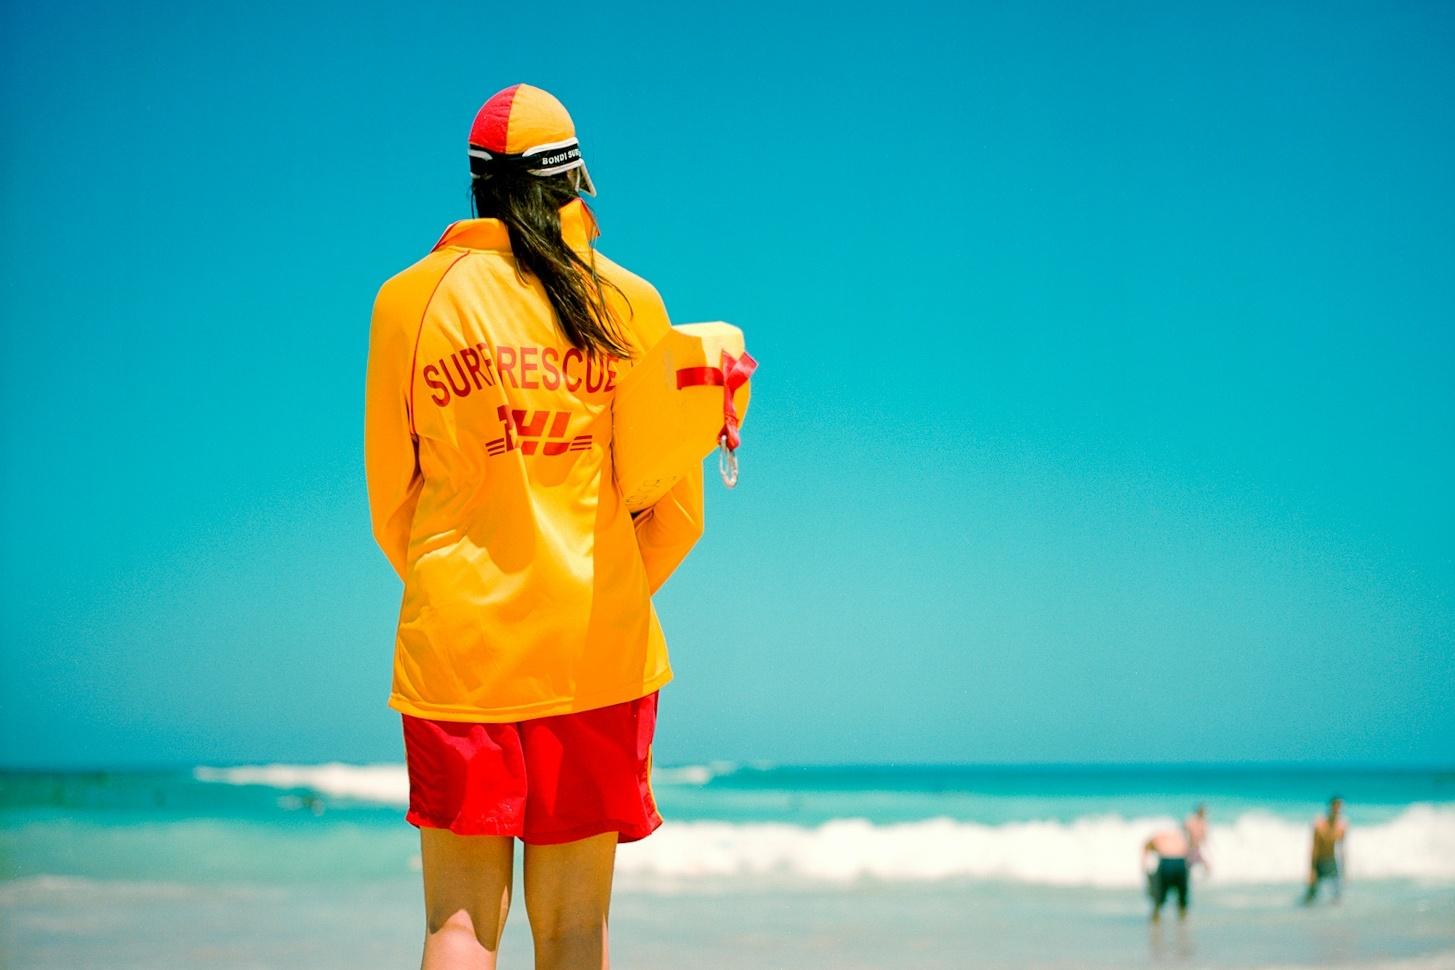 Dubai : a new female squad of liguards to ensure safety on beaches © Christopher Crouzet